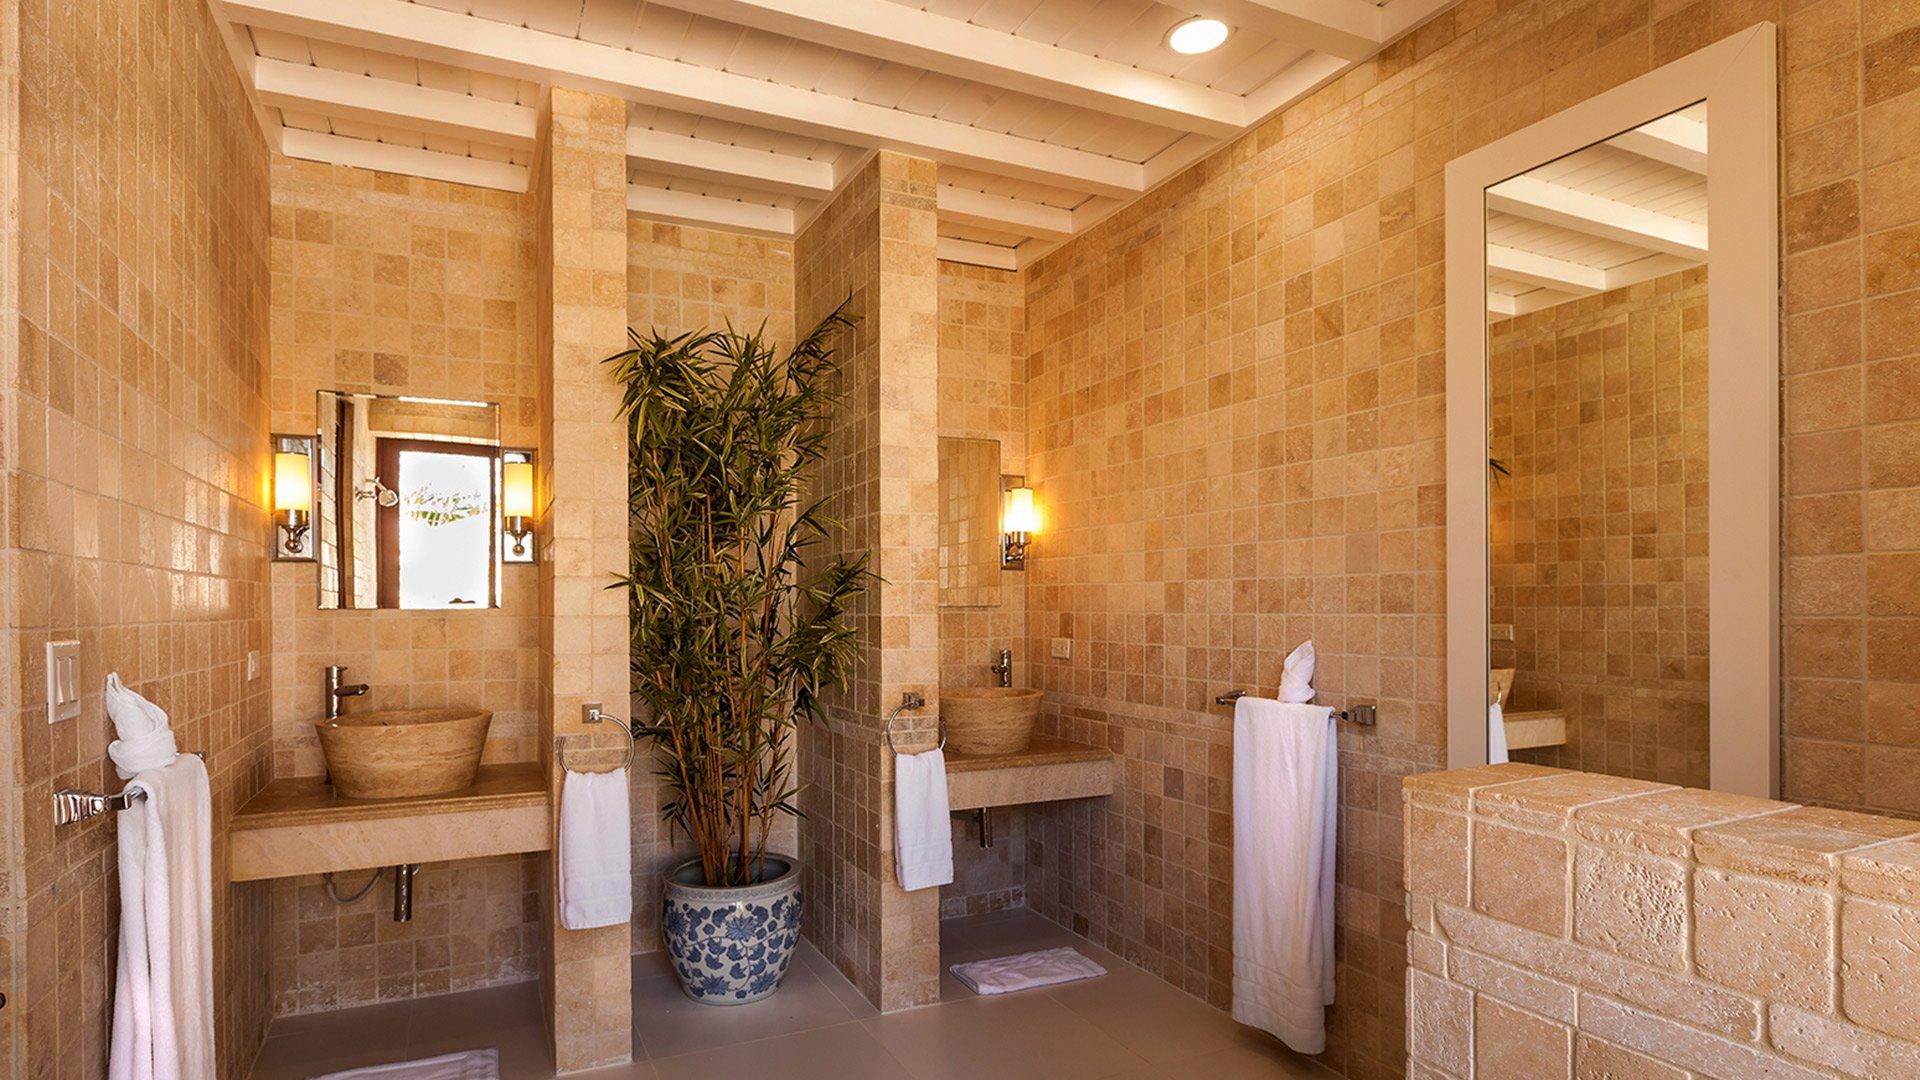 Indigo Villa Anguilla Rental Properties in Paradise bath